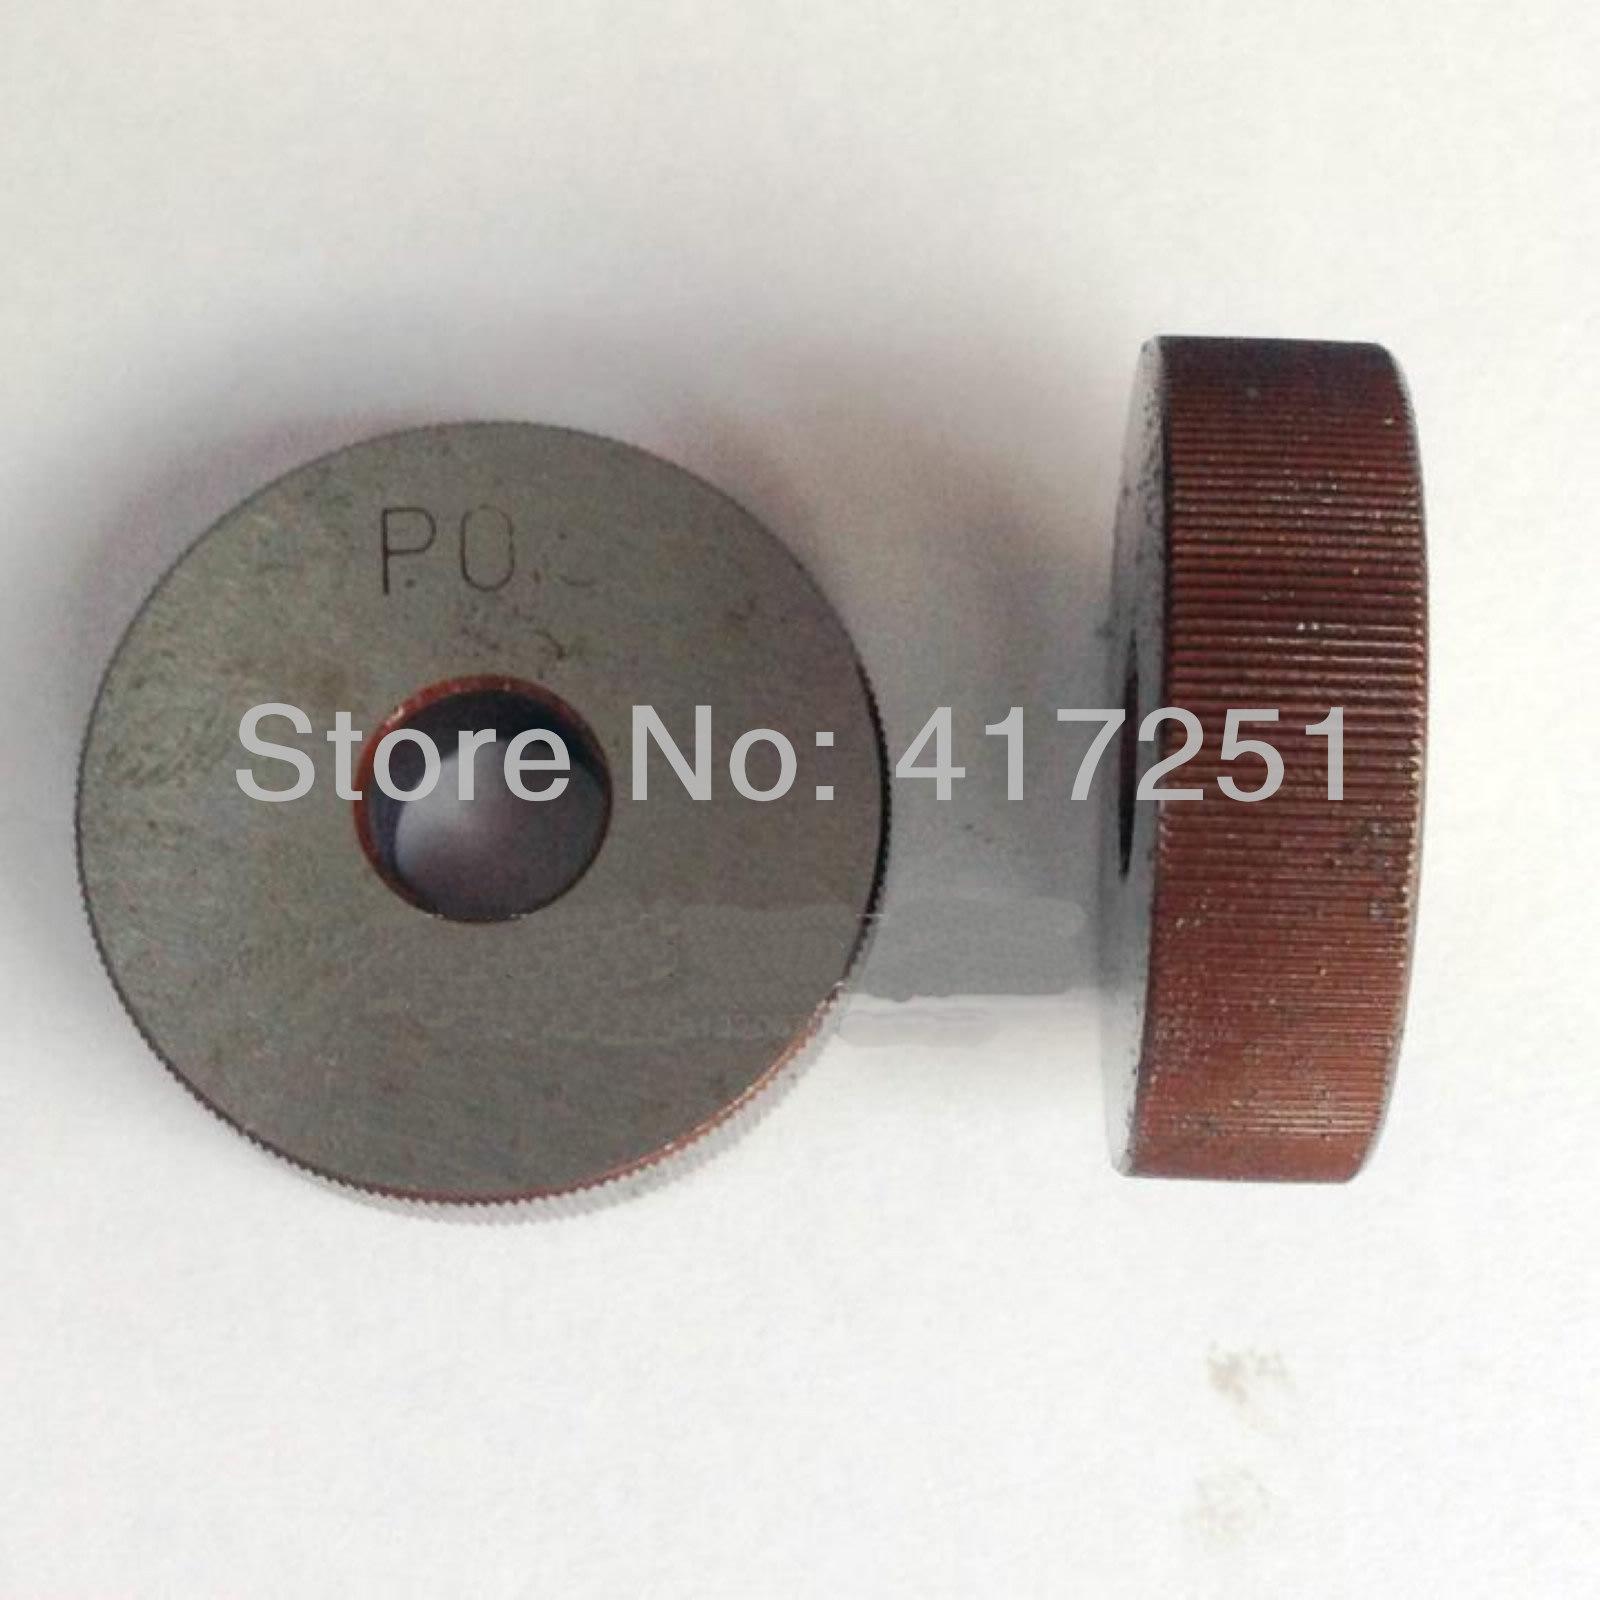 Фото Комплектующие к инструментам MRO 2 1,0 8 * 28 * 8 Wheel Knurling Linear комплектующие